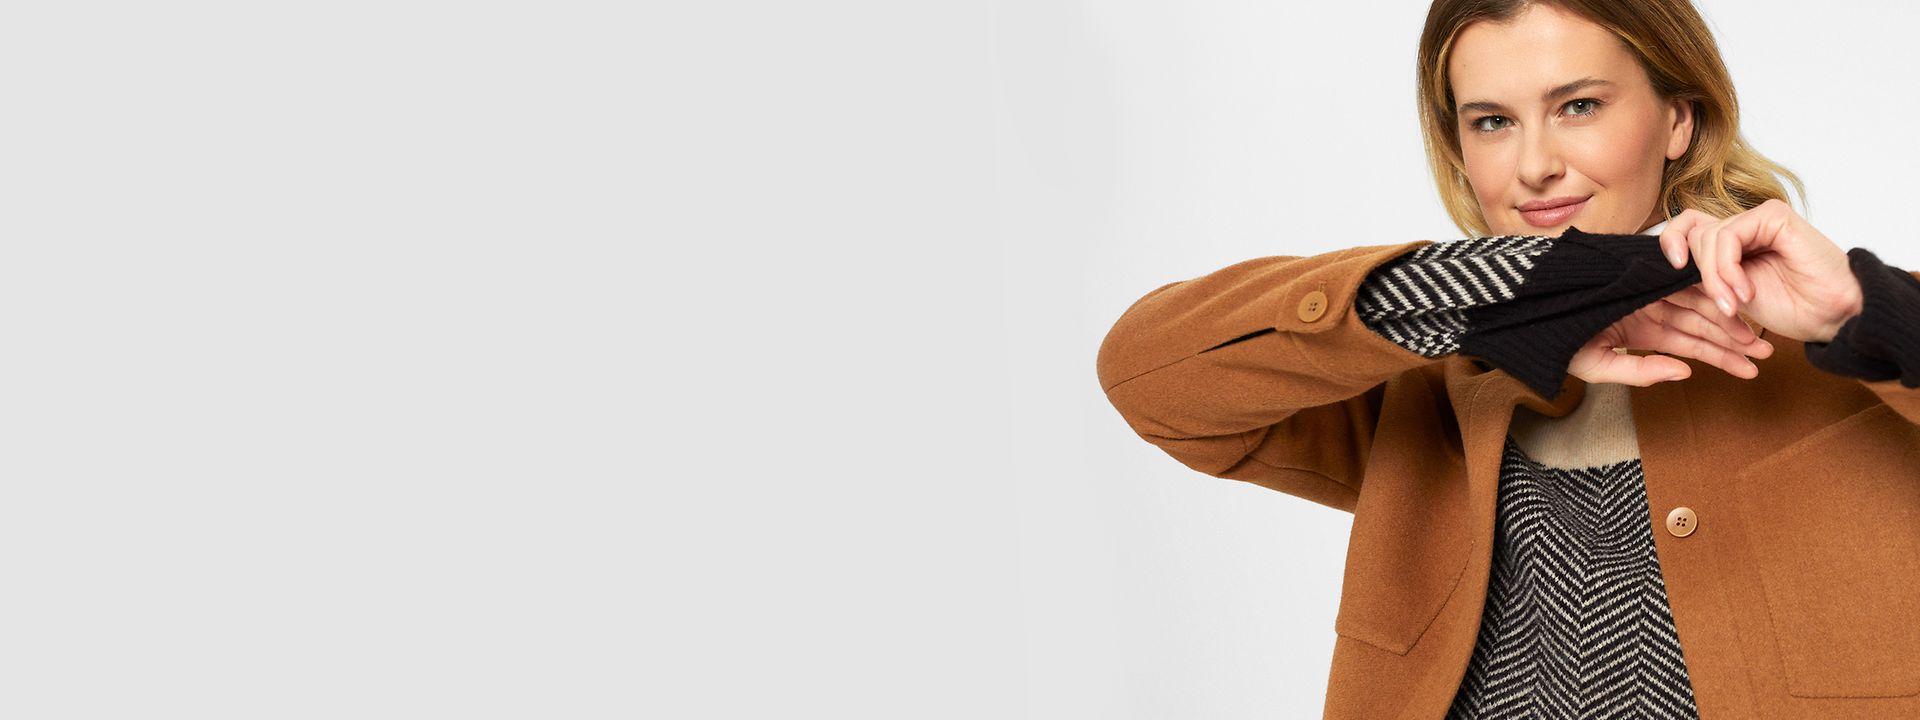 422021 - women - unknown startpage - hero medium - live shopping - knit - IMG